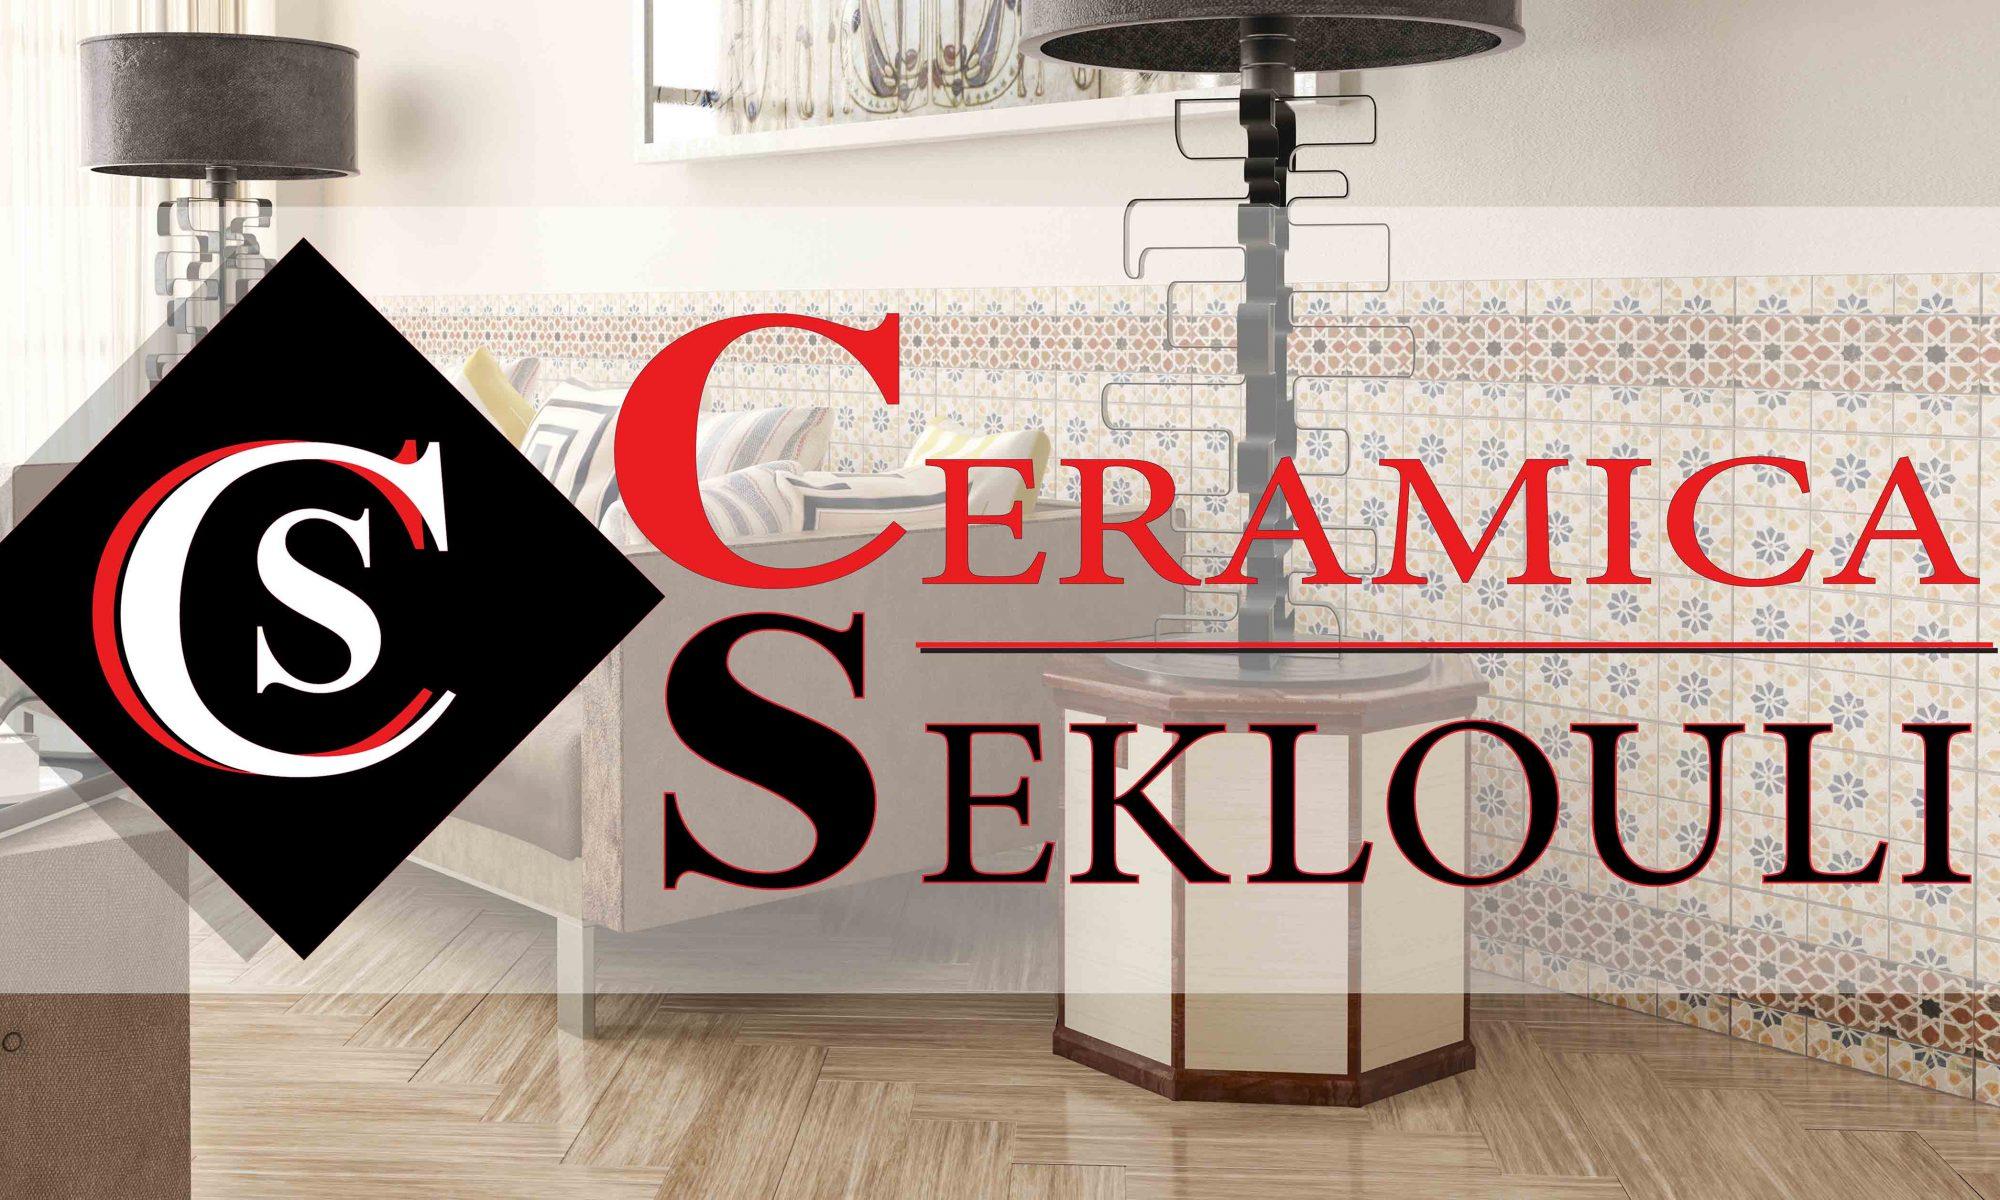 Ceramica Seklouli